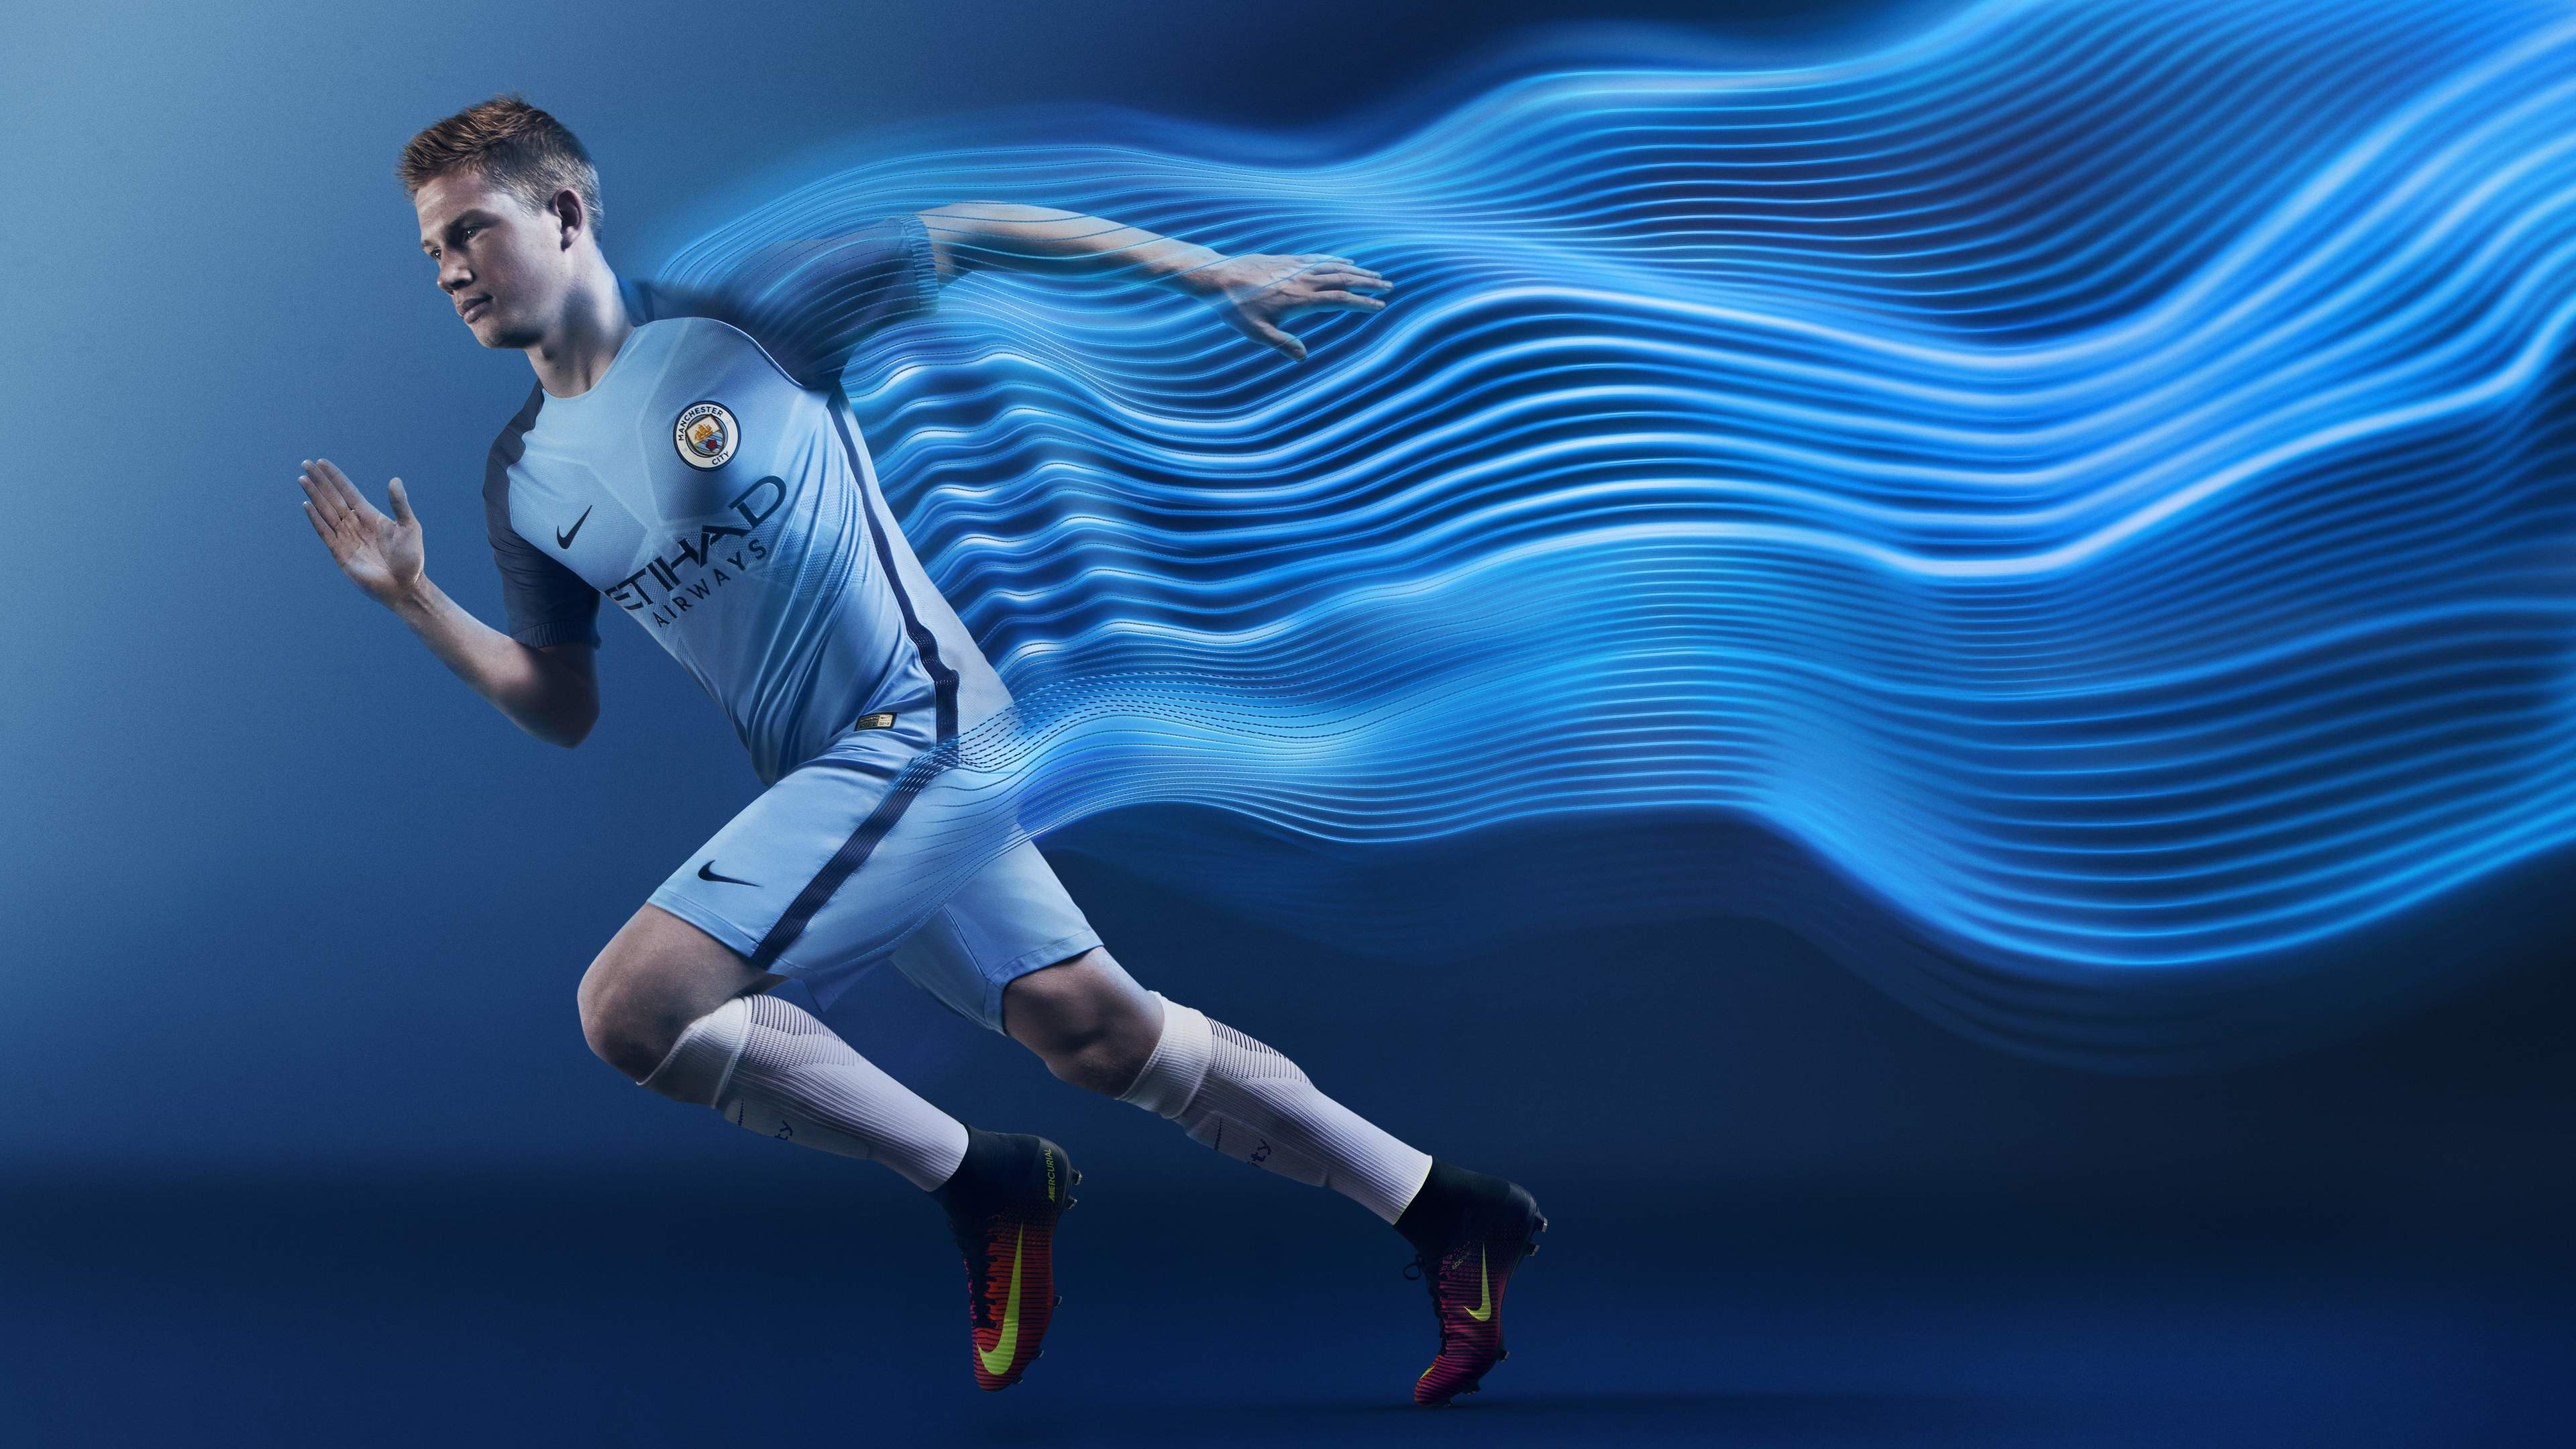 manchester city football player 1538786985 - Manchester City Football Player - sports wallpapers, soccer wallpapers, hd-wallpapers, football wallpapers, 8k wallpapers, 5k wallpapers, 4k-wallpapers, 15k wallpapers, 12k wallpapers, 10k wallpapers